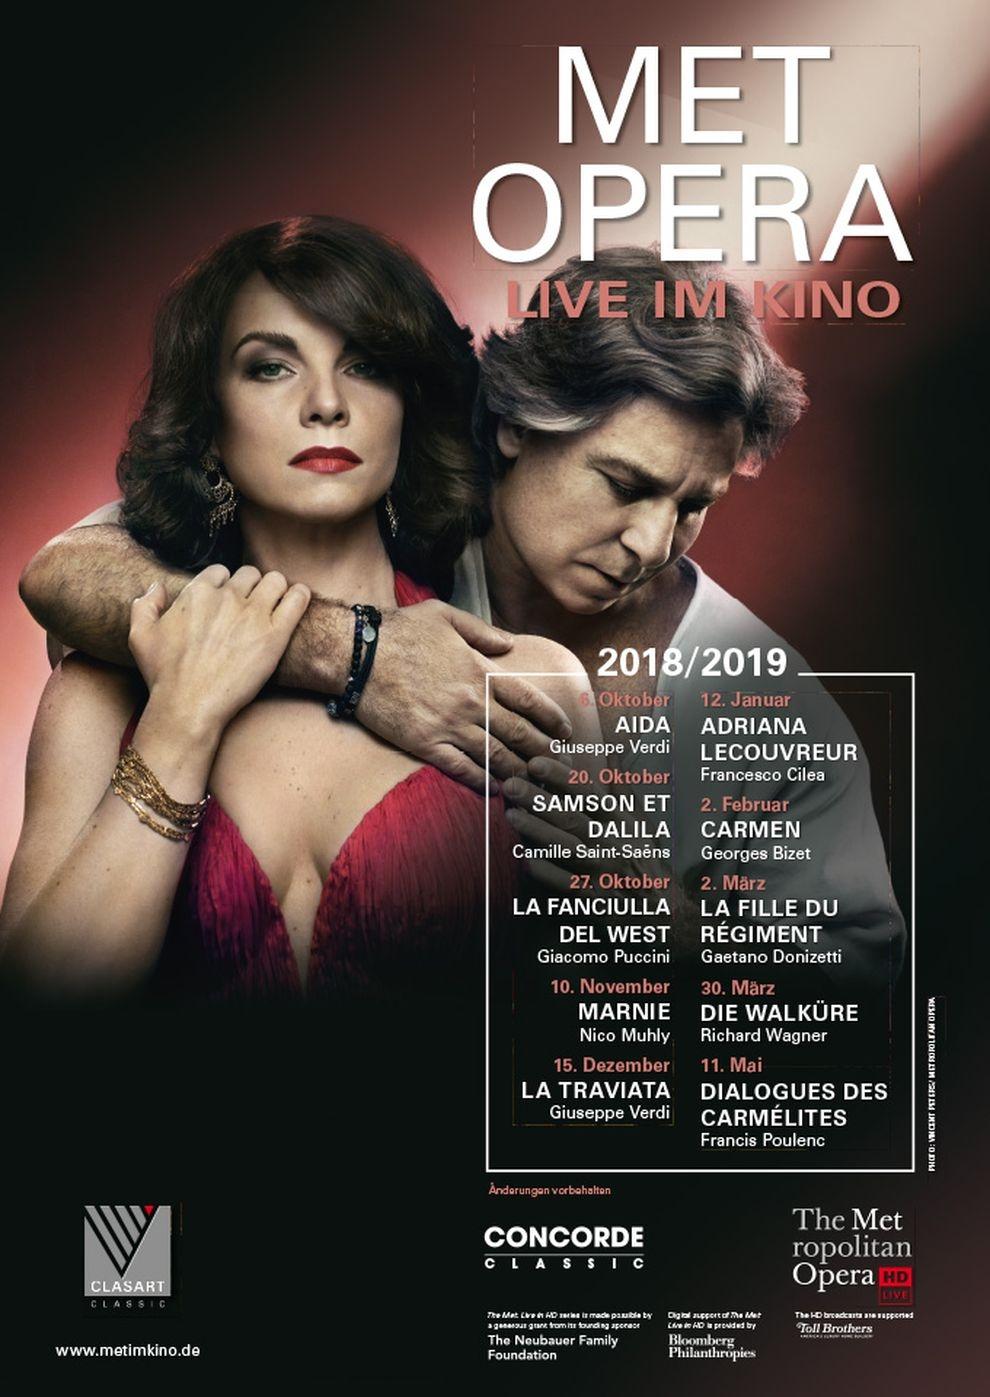 Met Opera 2018/19: La Traviata (Verdi) (Poster)